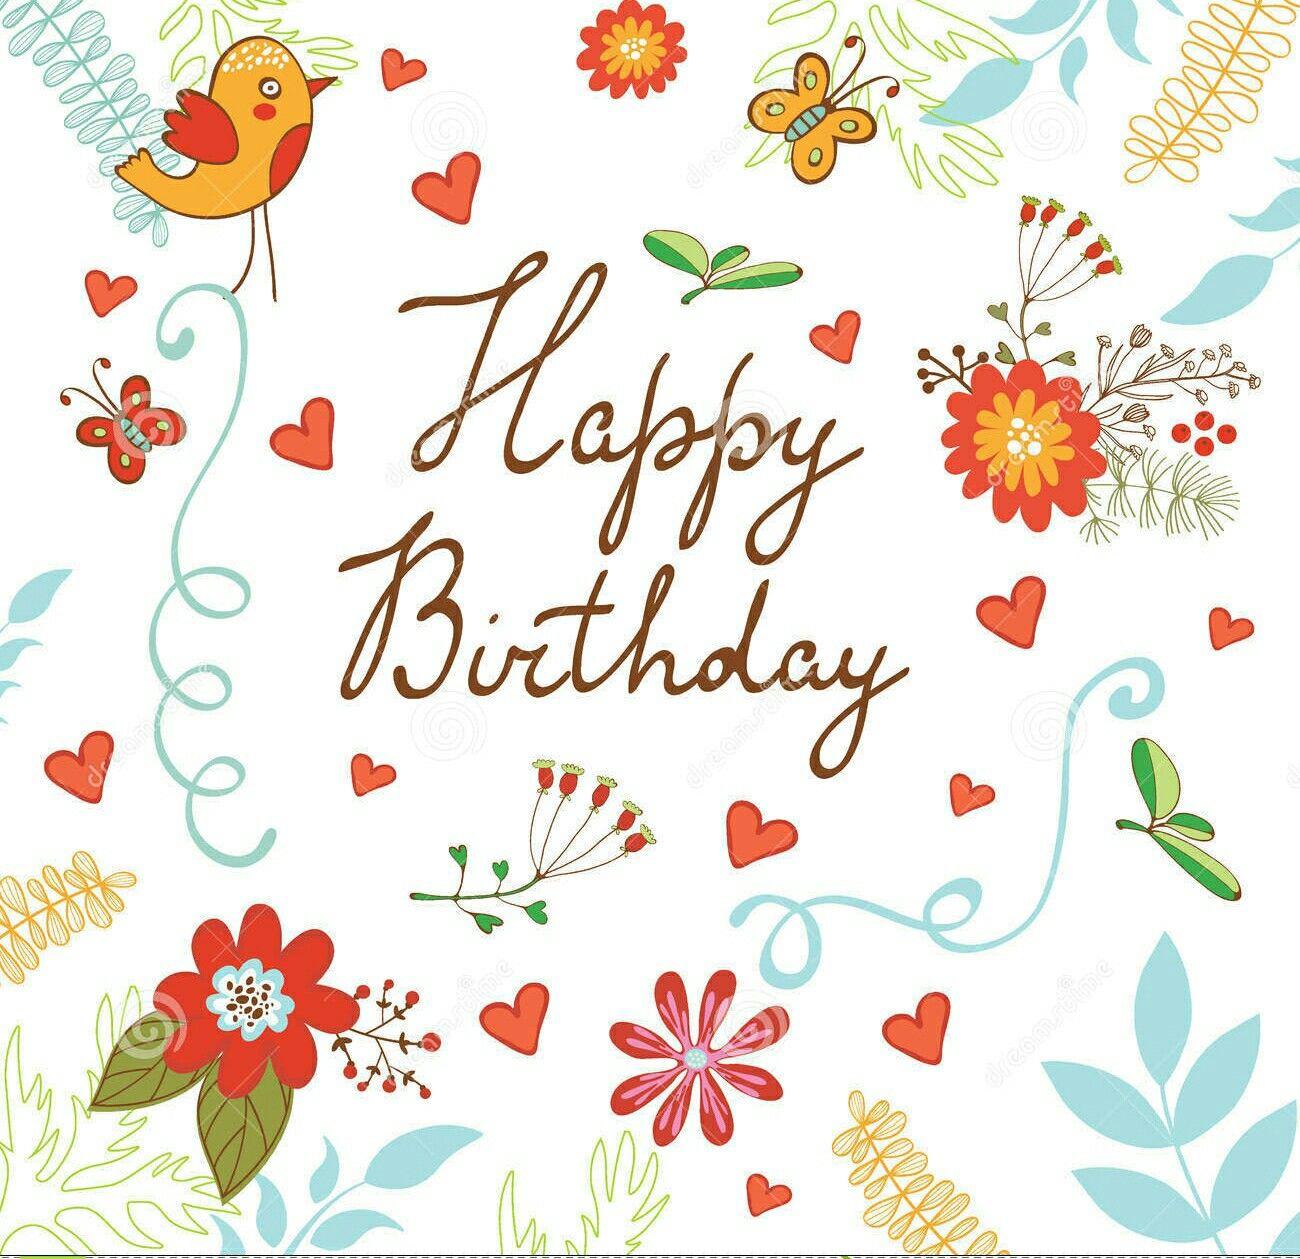 Happy Birthday Happybirthday Flowers Bird Birthday Wishes